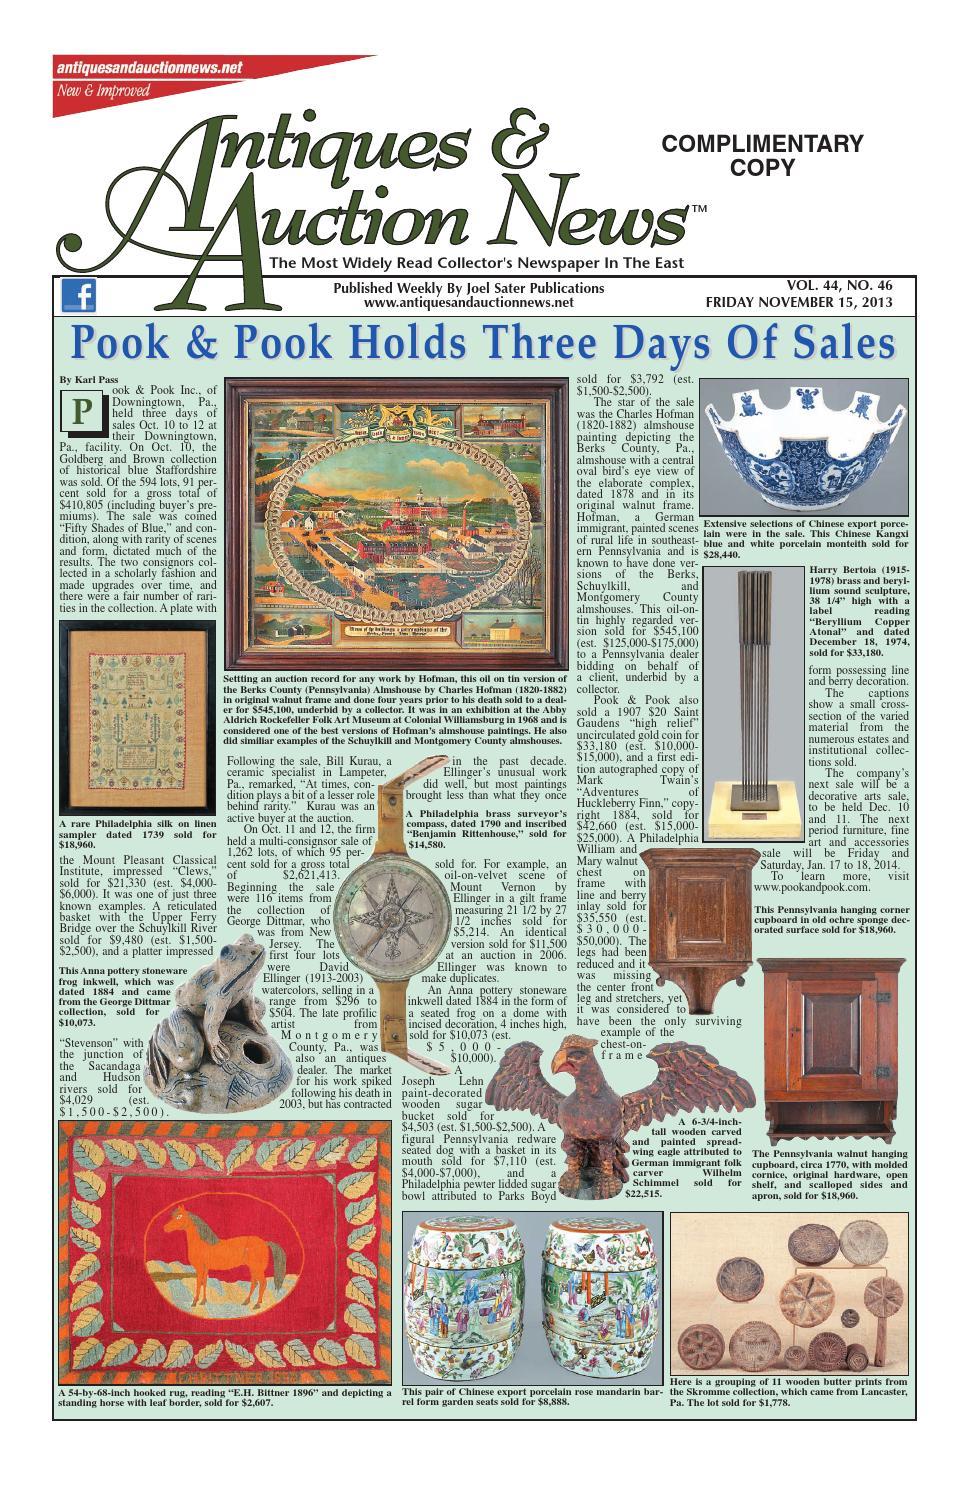 Antiques & Auction News 111513 by Antiques & Auction News - issuu